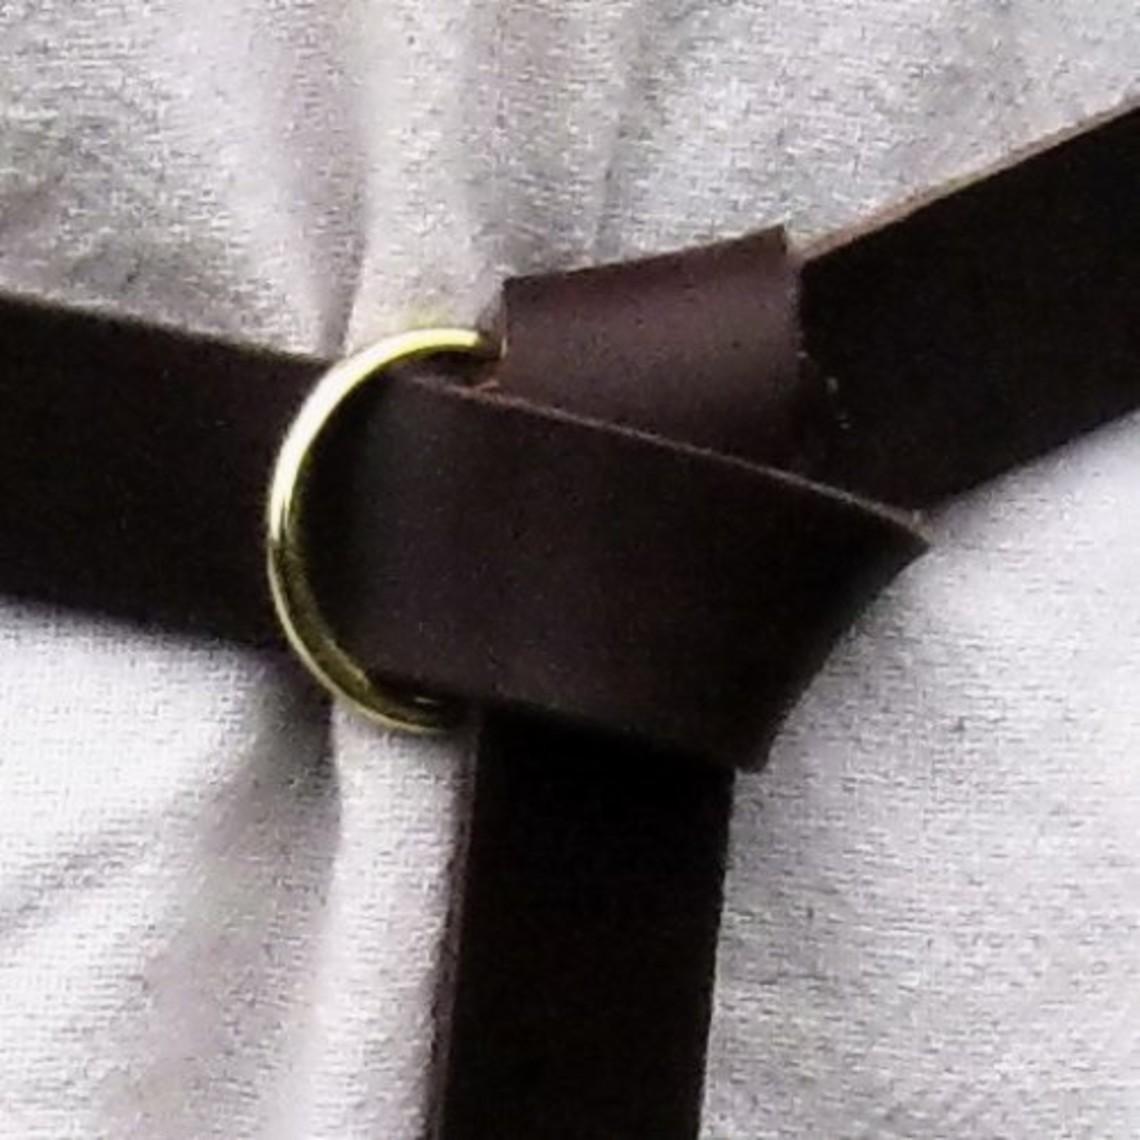 Leren riem met ringsluiting 4cm, bruin splitleer